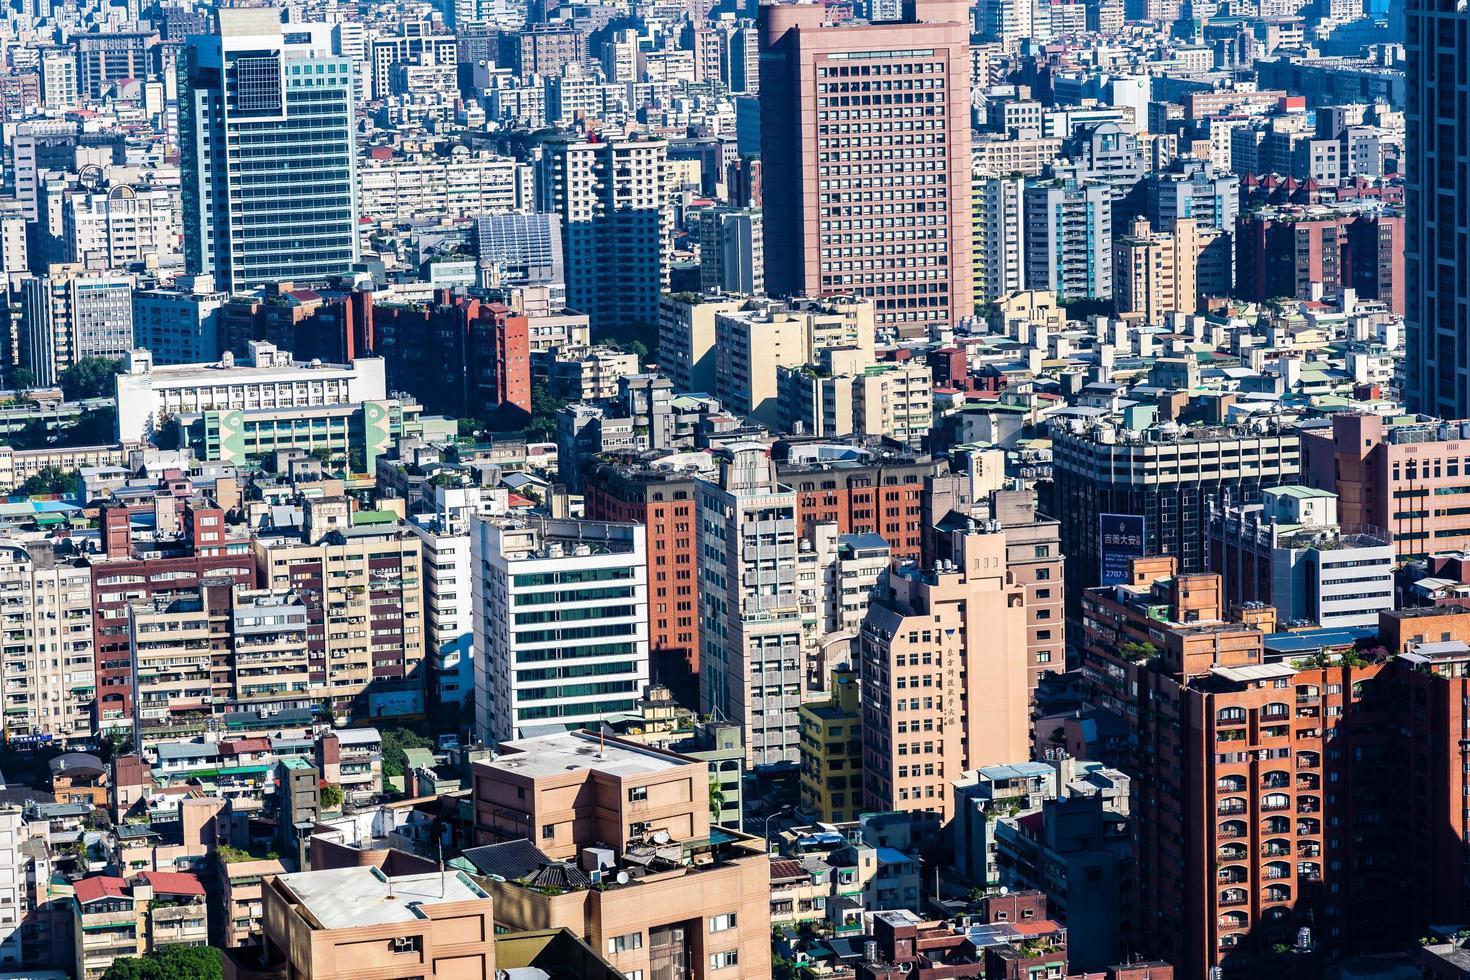 Paysage urbain de la ville de taipei à taiwan photo